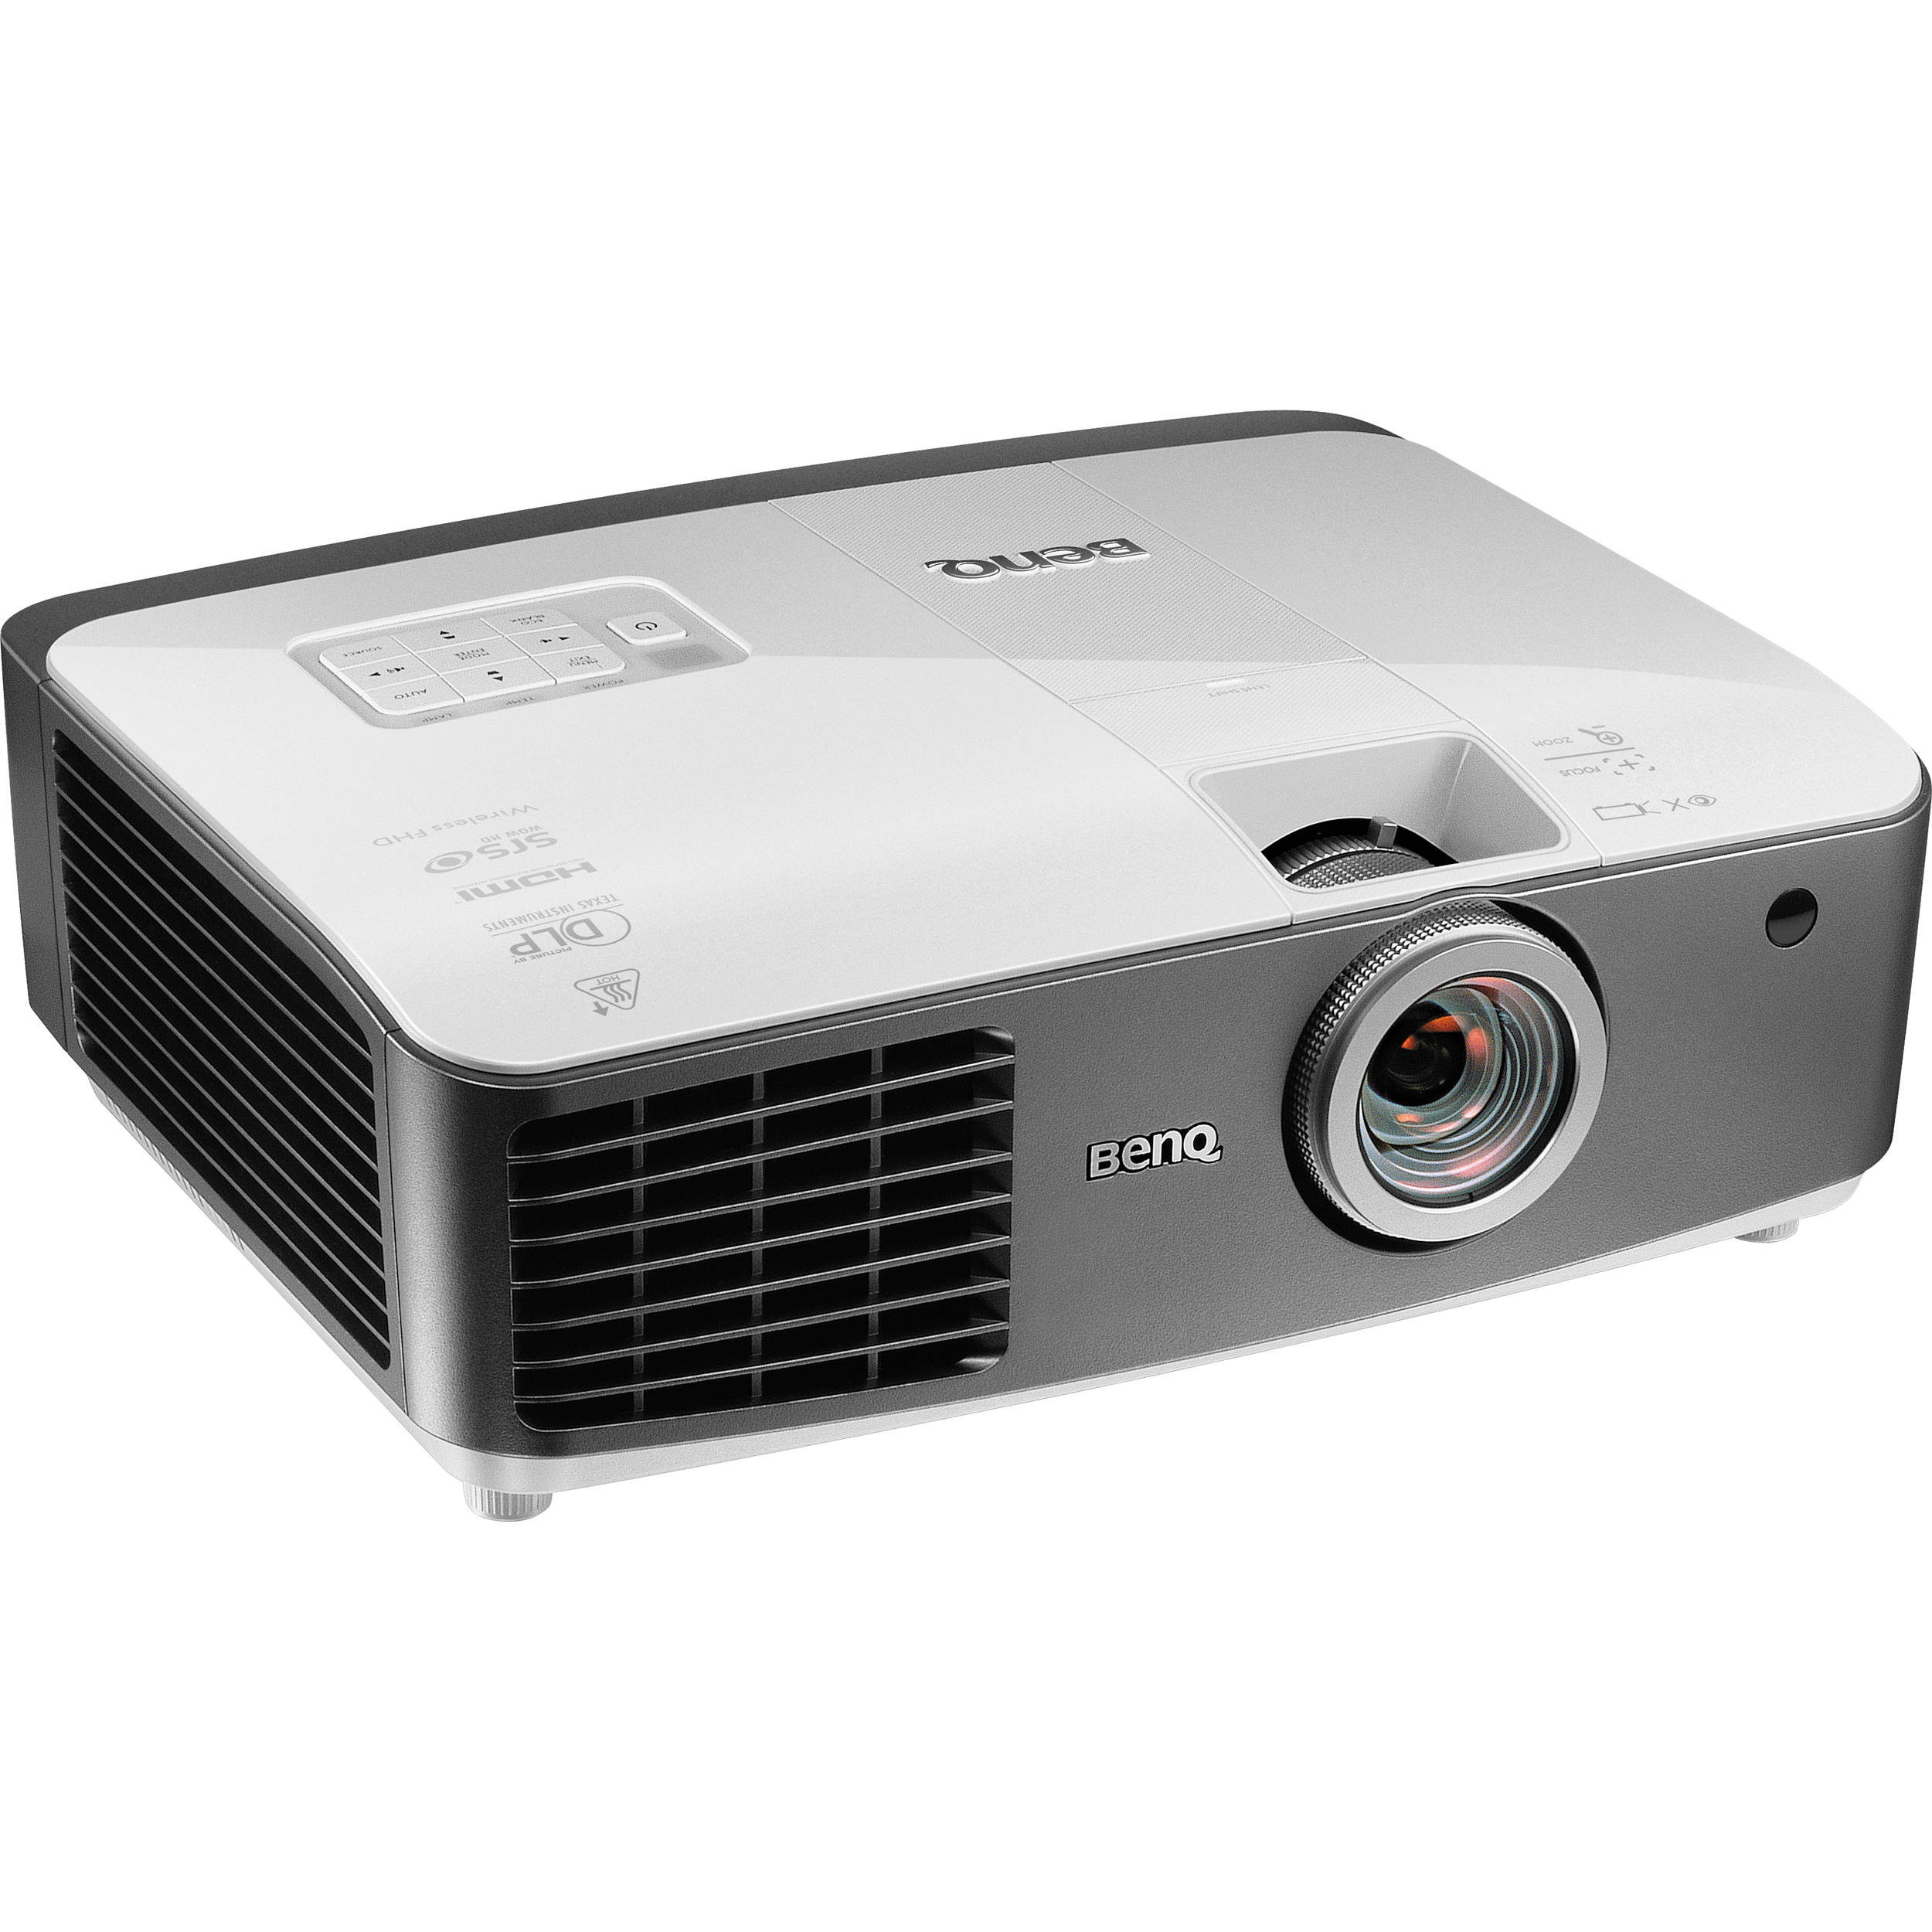 W1500 3D Short Full Home Throw Cinema BenQ Series 1080p Projector HD rCxBdoeW